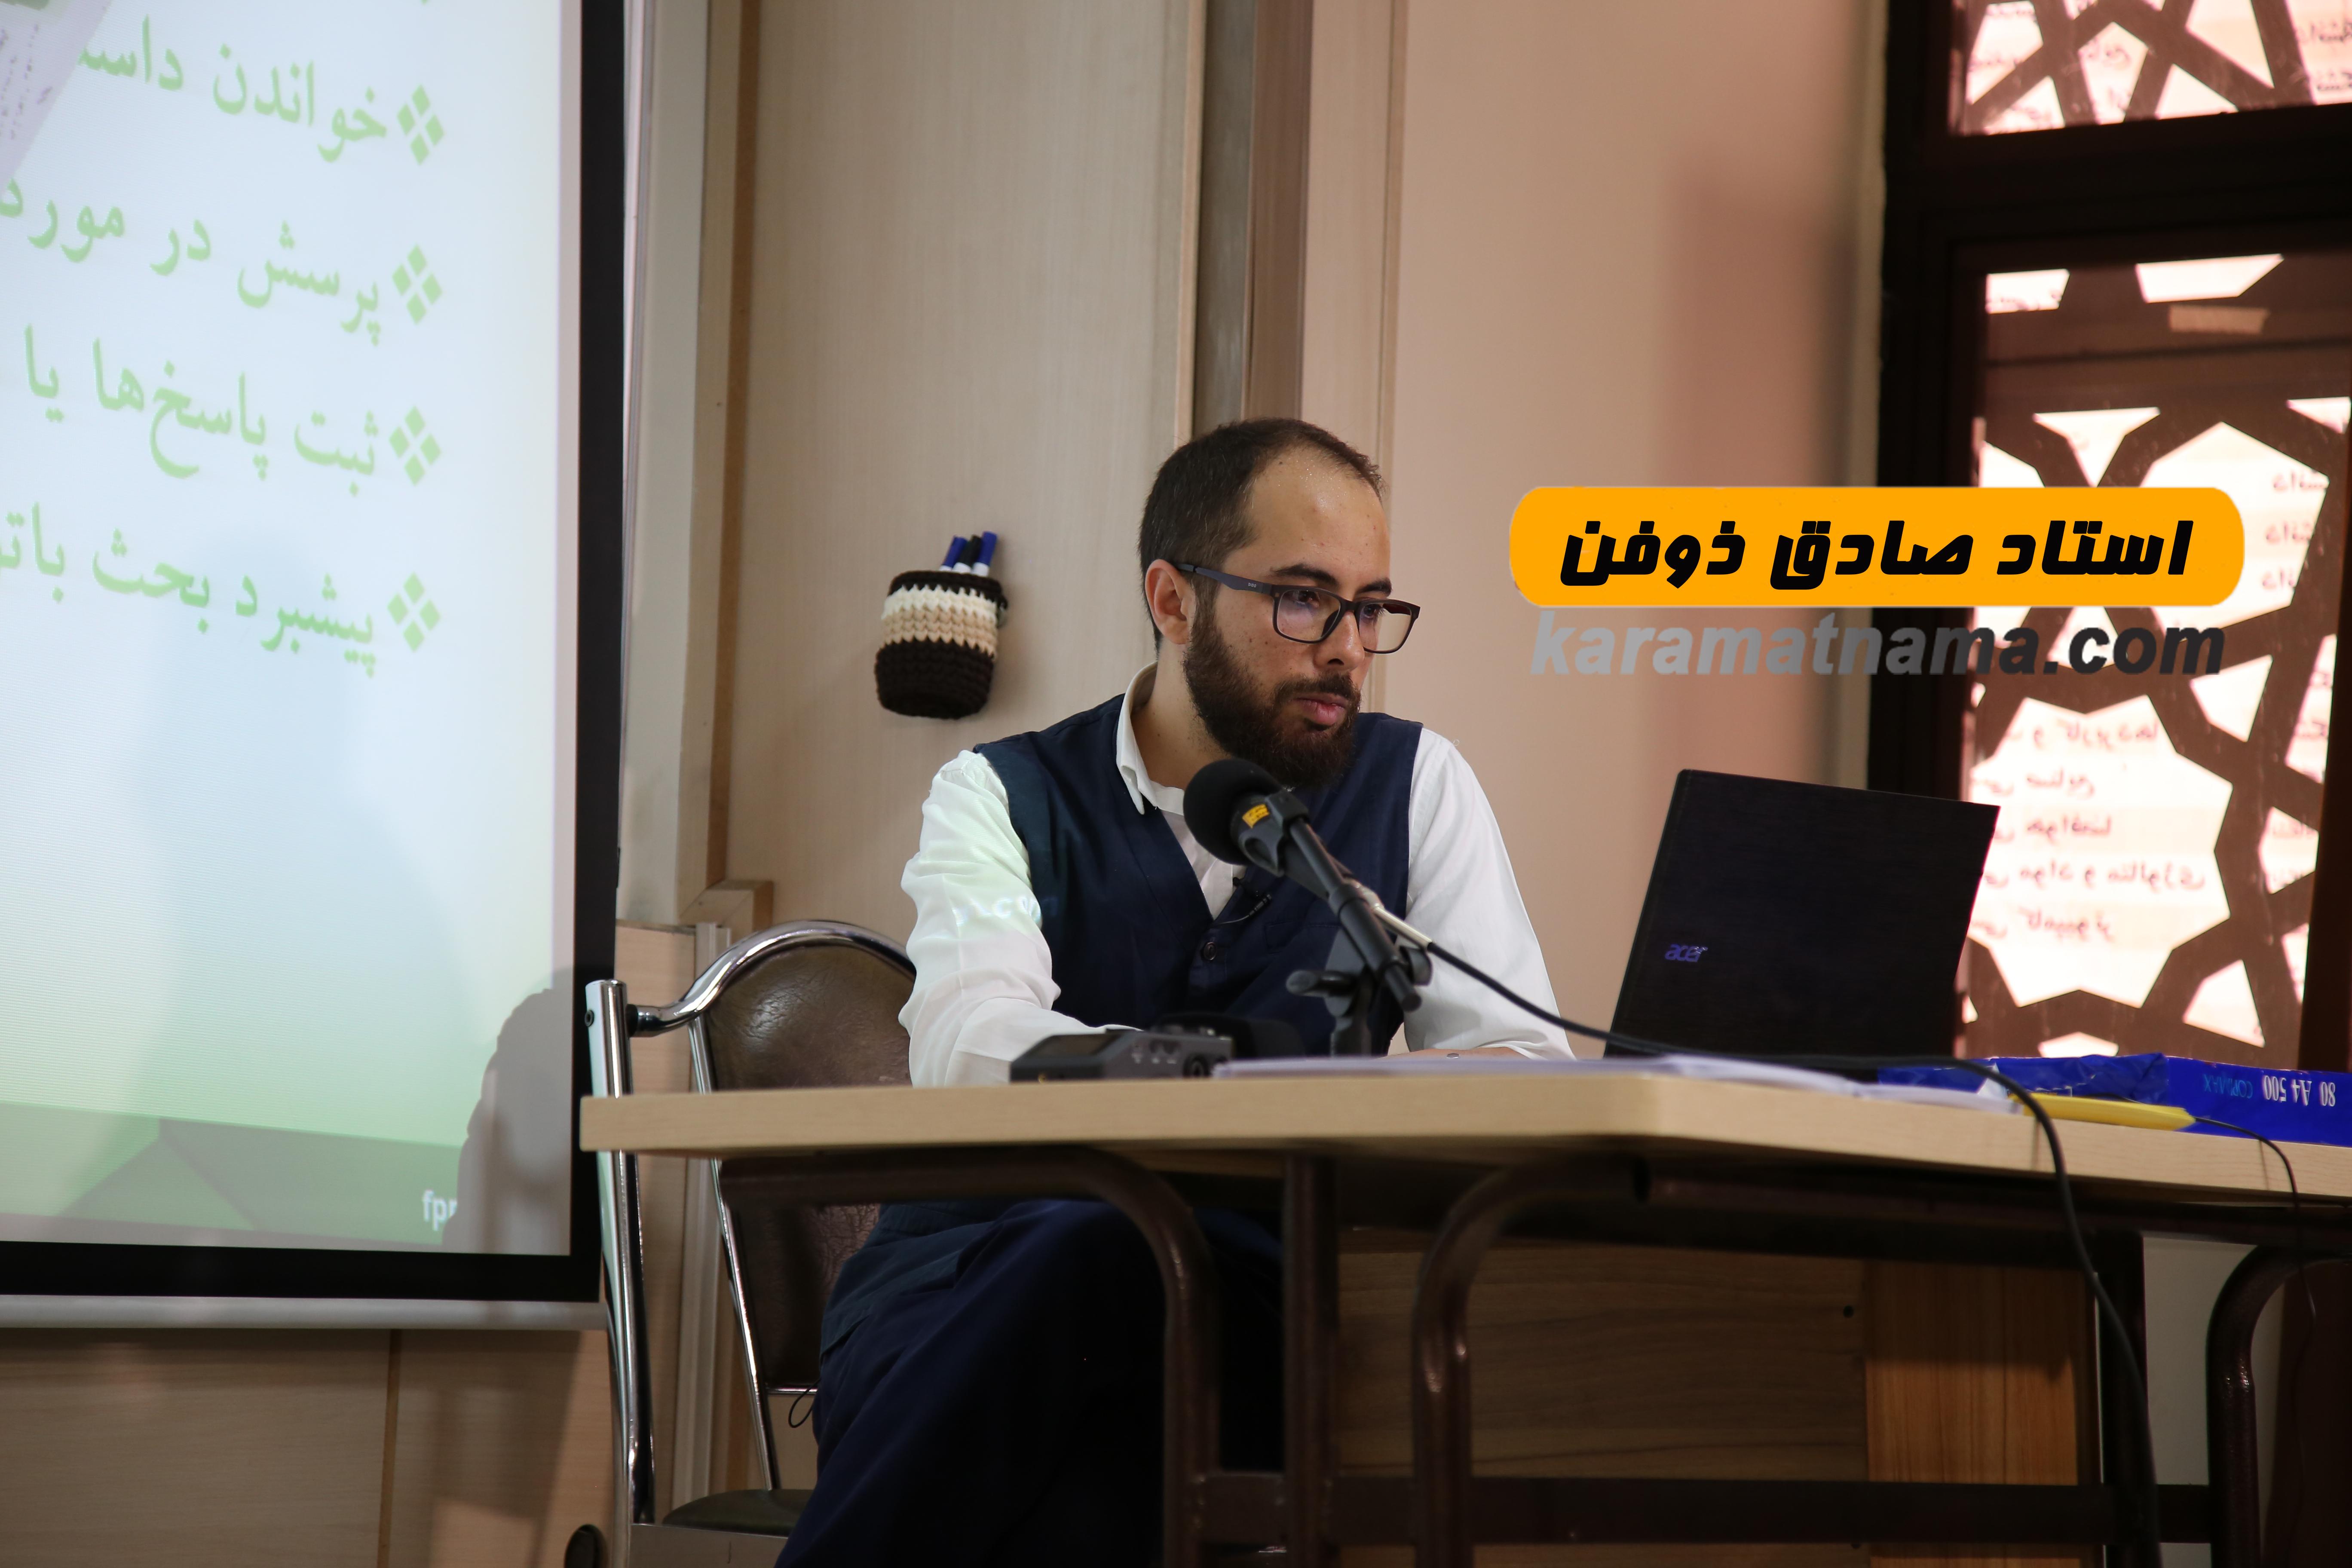 جناب آقای صادق ذوفن - مدرس کارگاه تربیت مربی فکرپروری